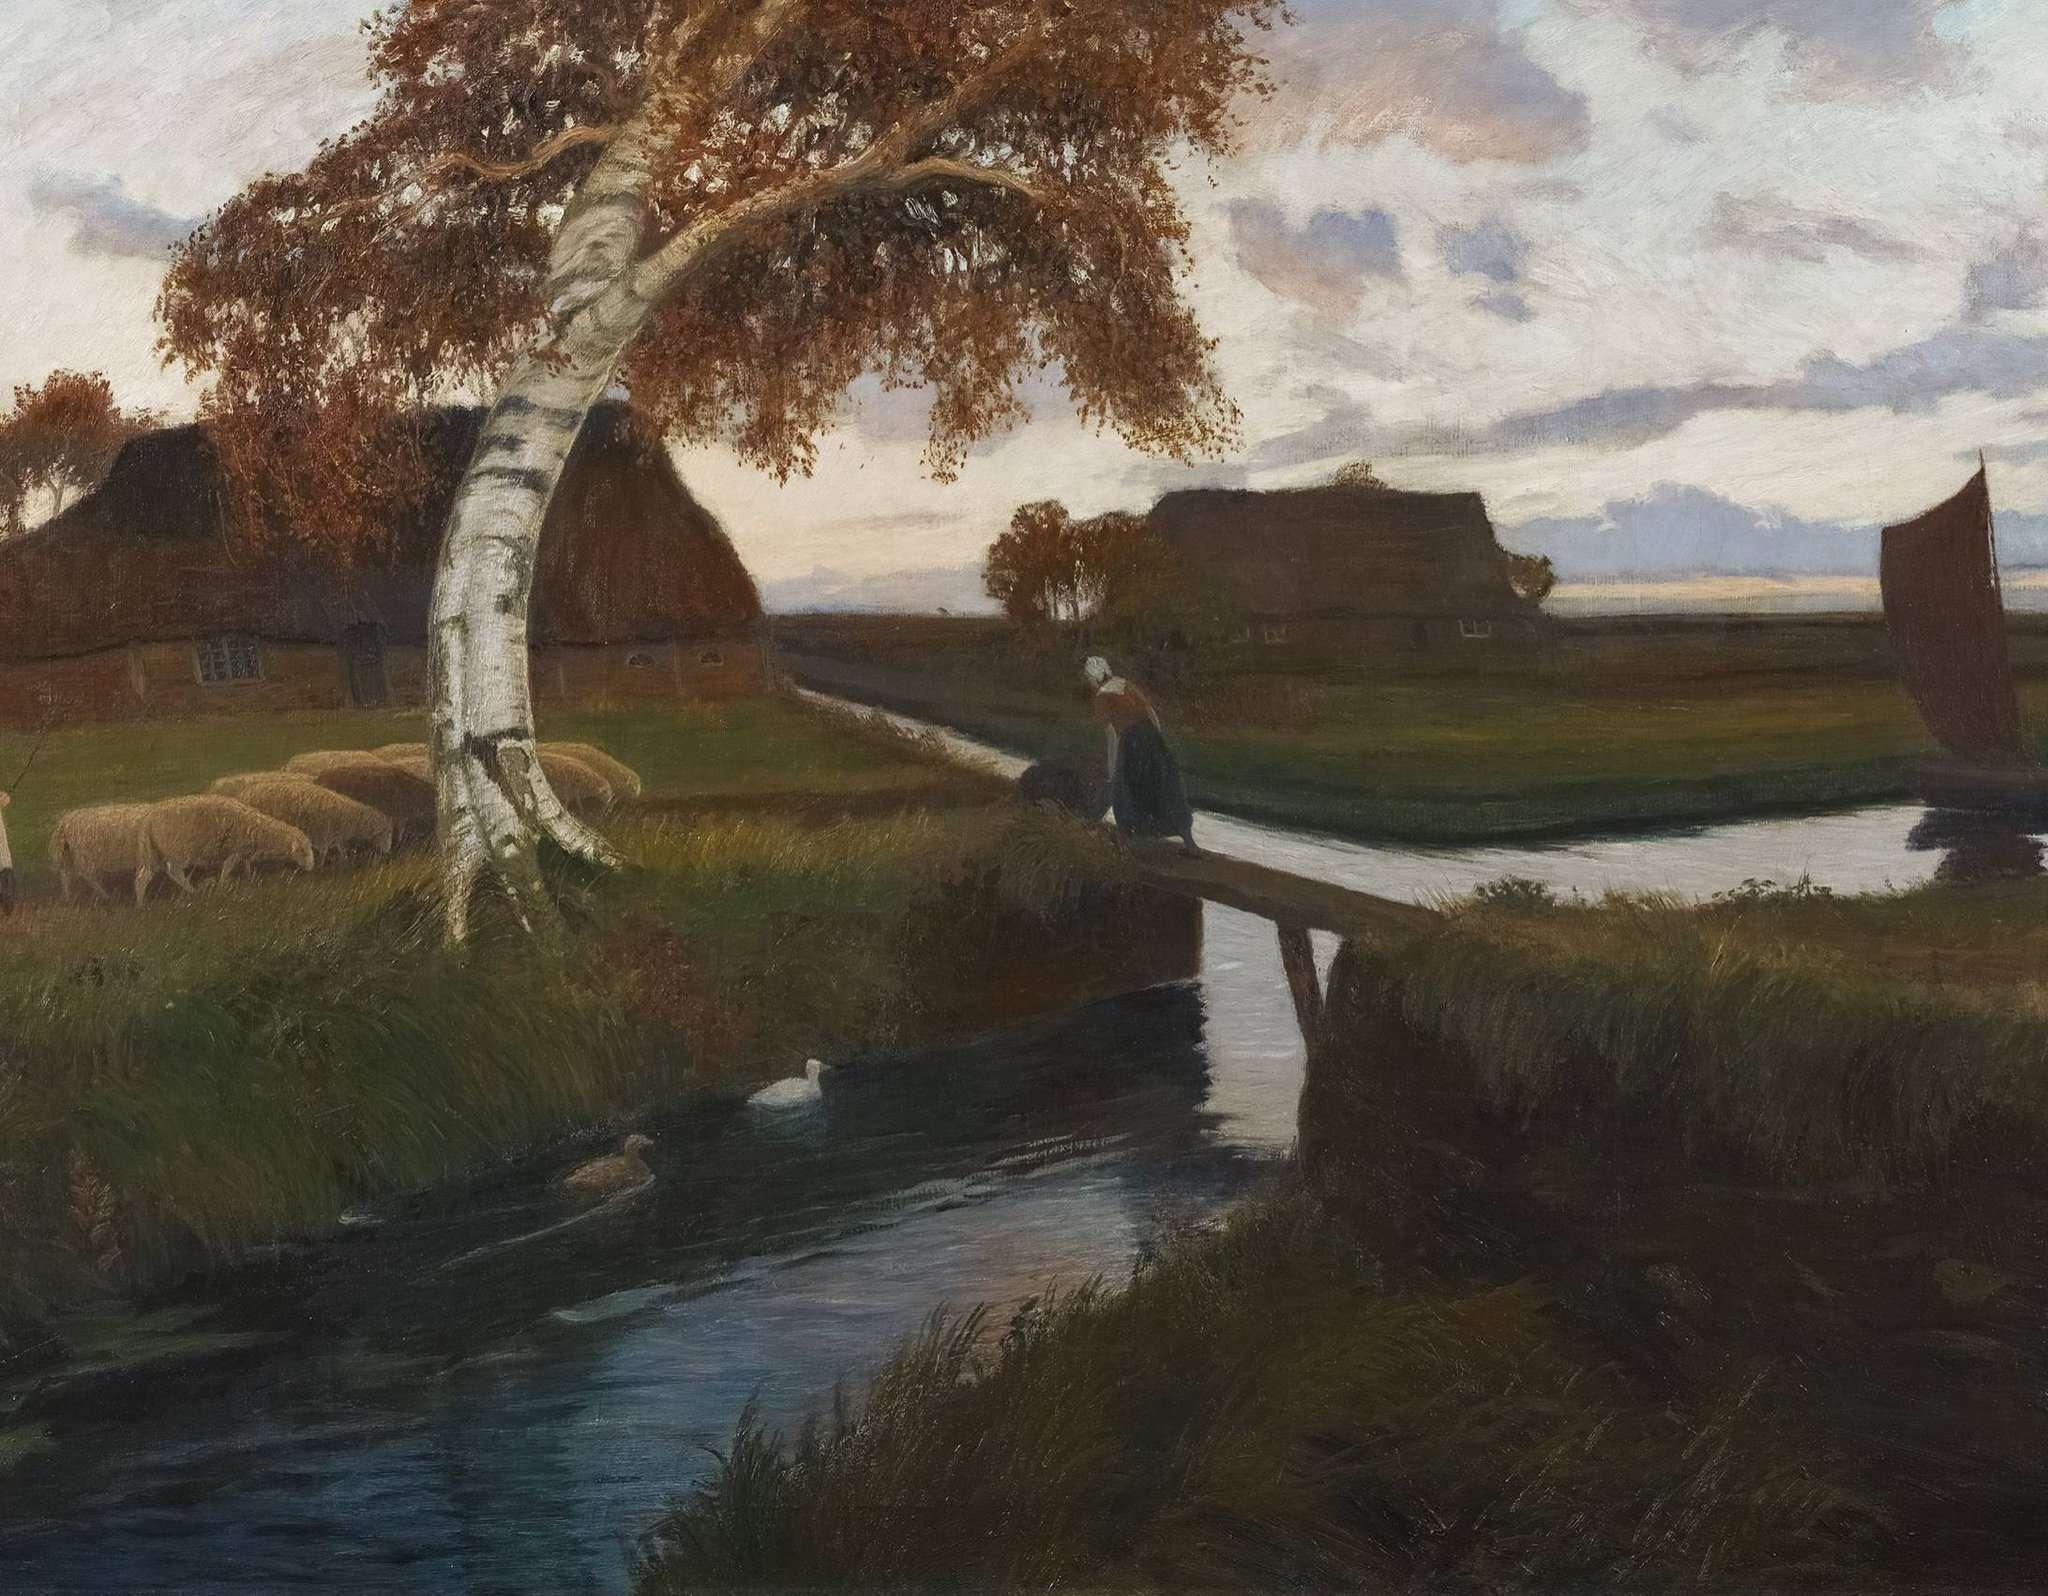 Otto Modersohn: Abend im Moordorf, 1898